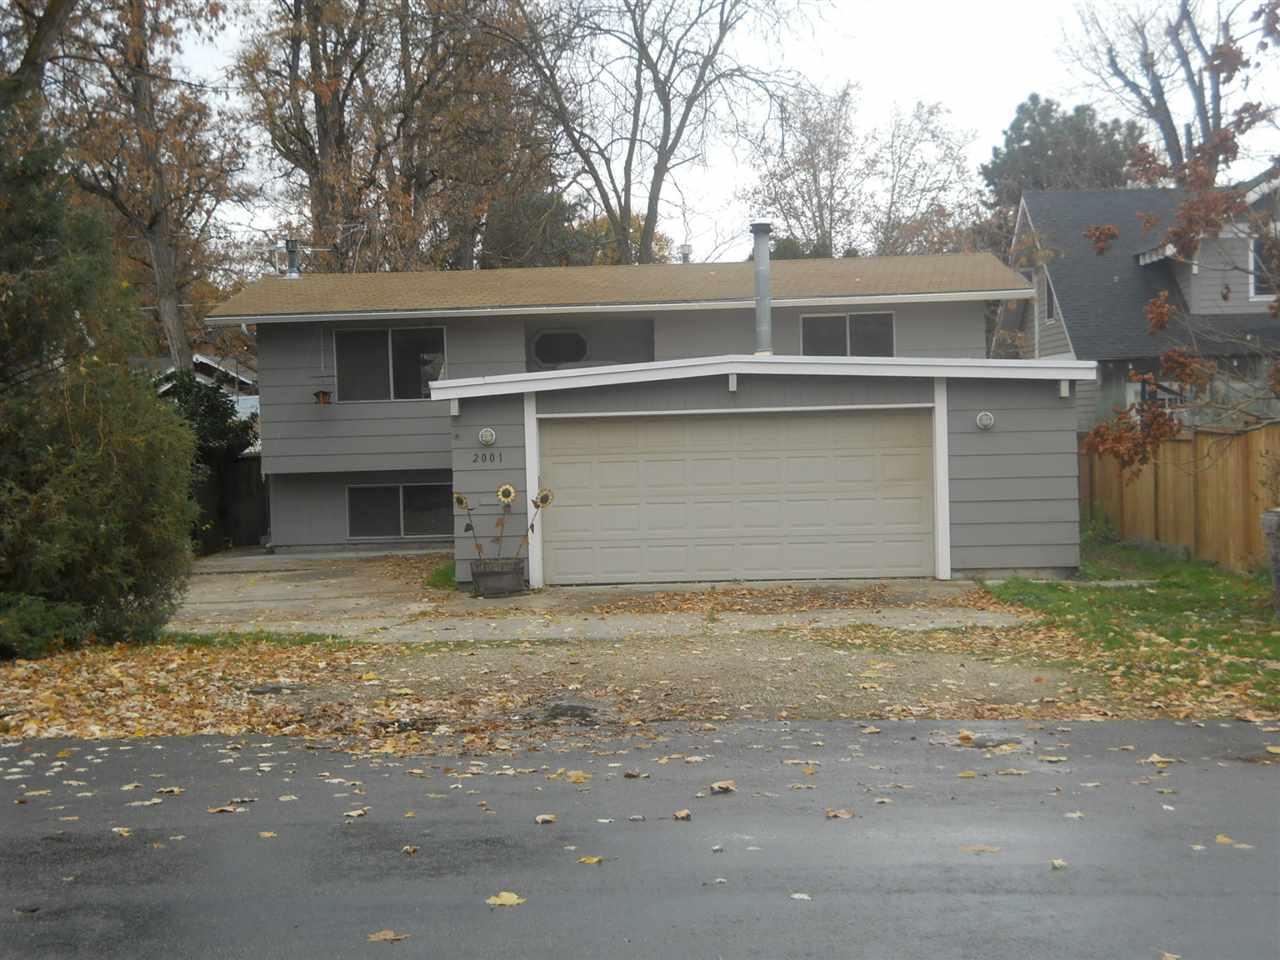 2001 N 20th,Boise,Idaho 83702,2 Bedrooms Bedrooms,1 BathroomBathrooms,Residential Income,2001 N 20th,98676183